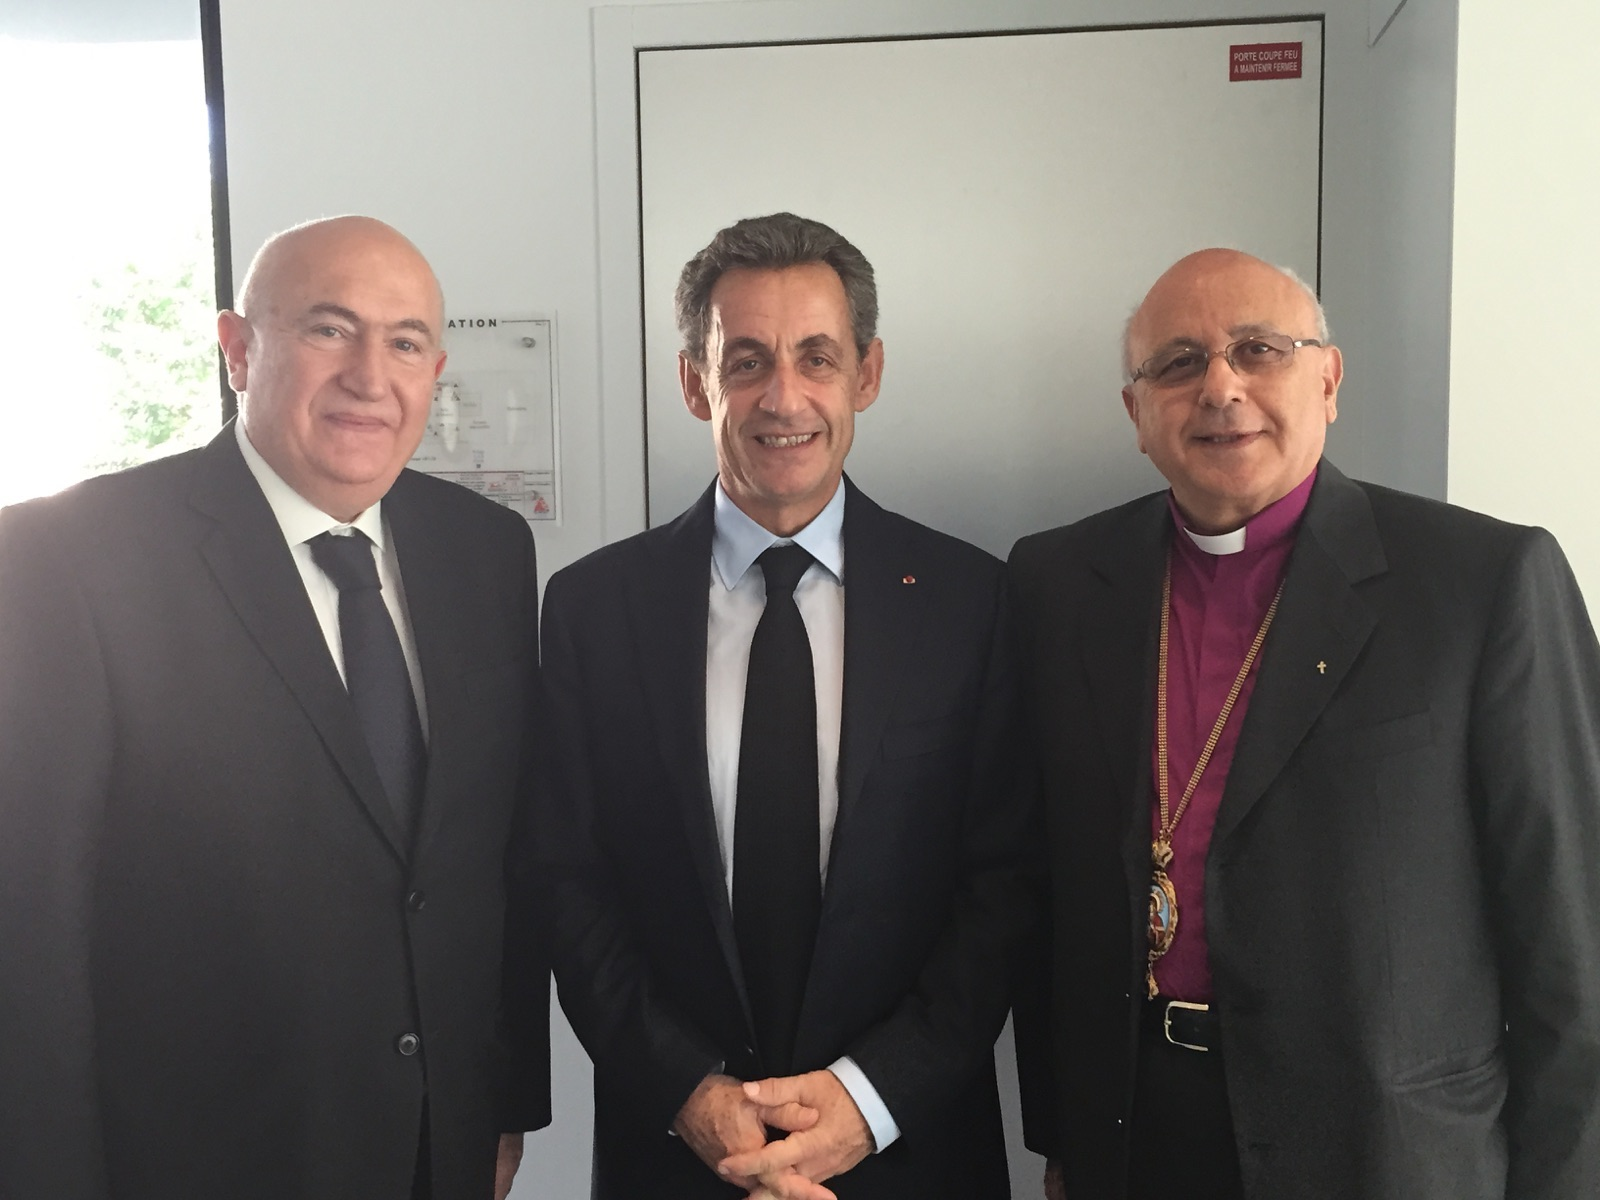 Lebanese bishop John Issam Darwish meets former French president Nicolas Sarkozy